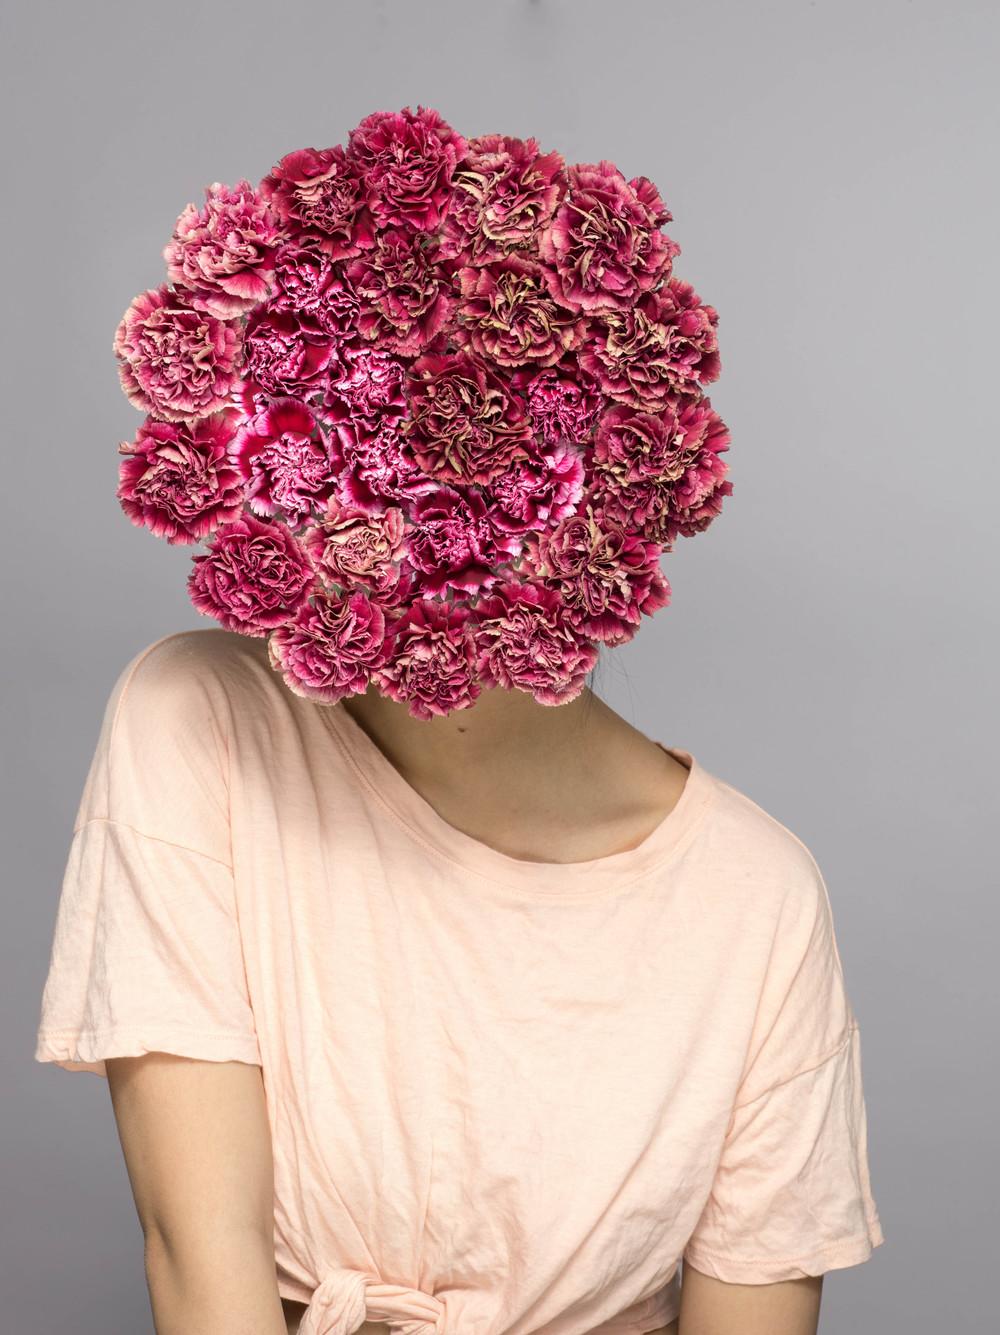 FLOWER HEADS 28844.jpg